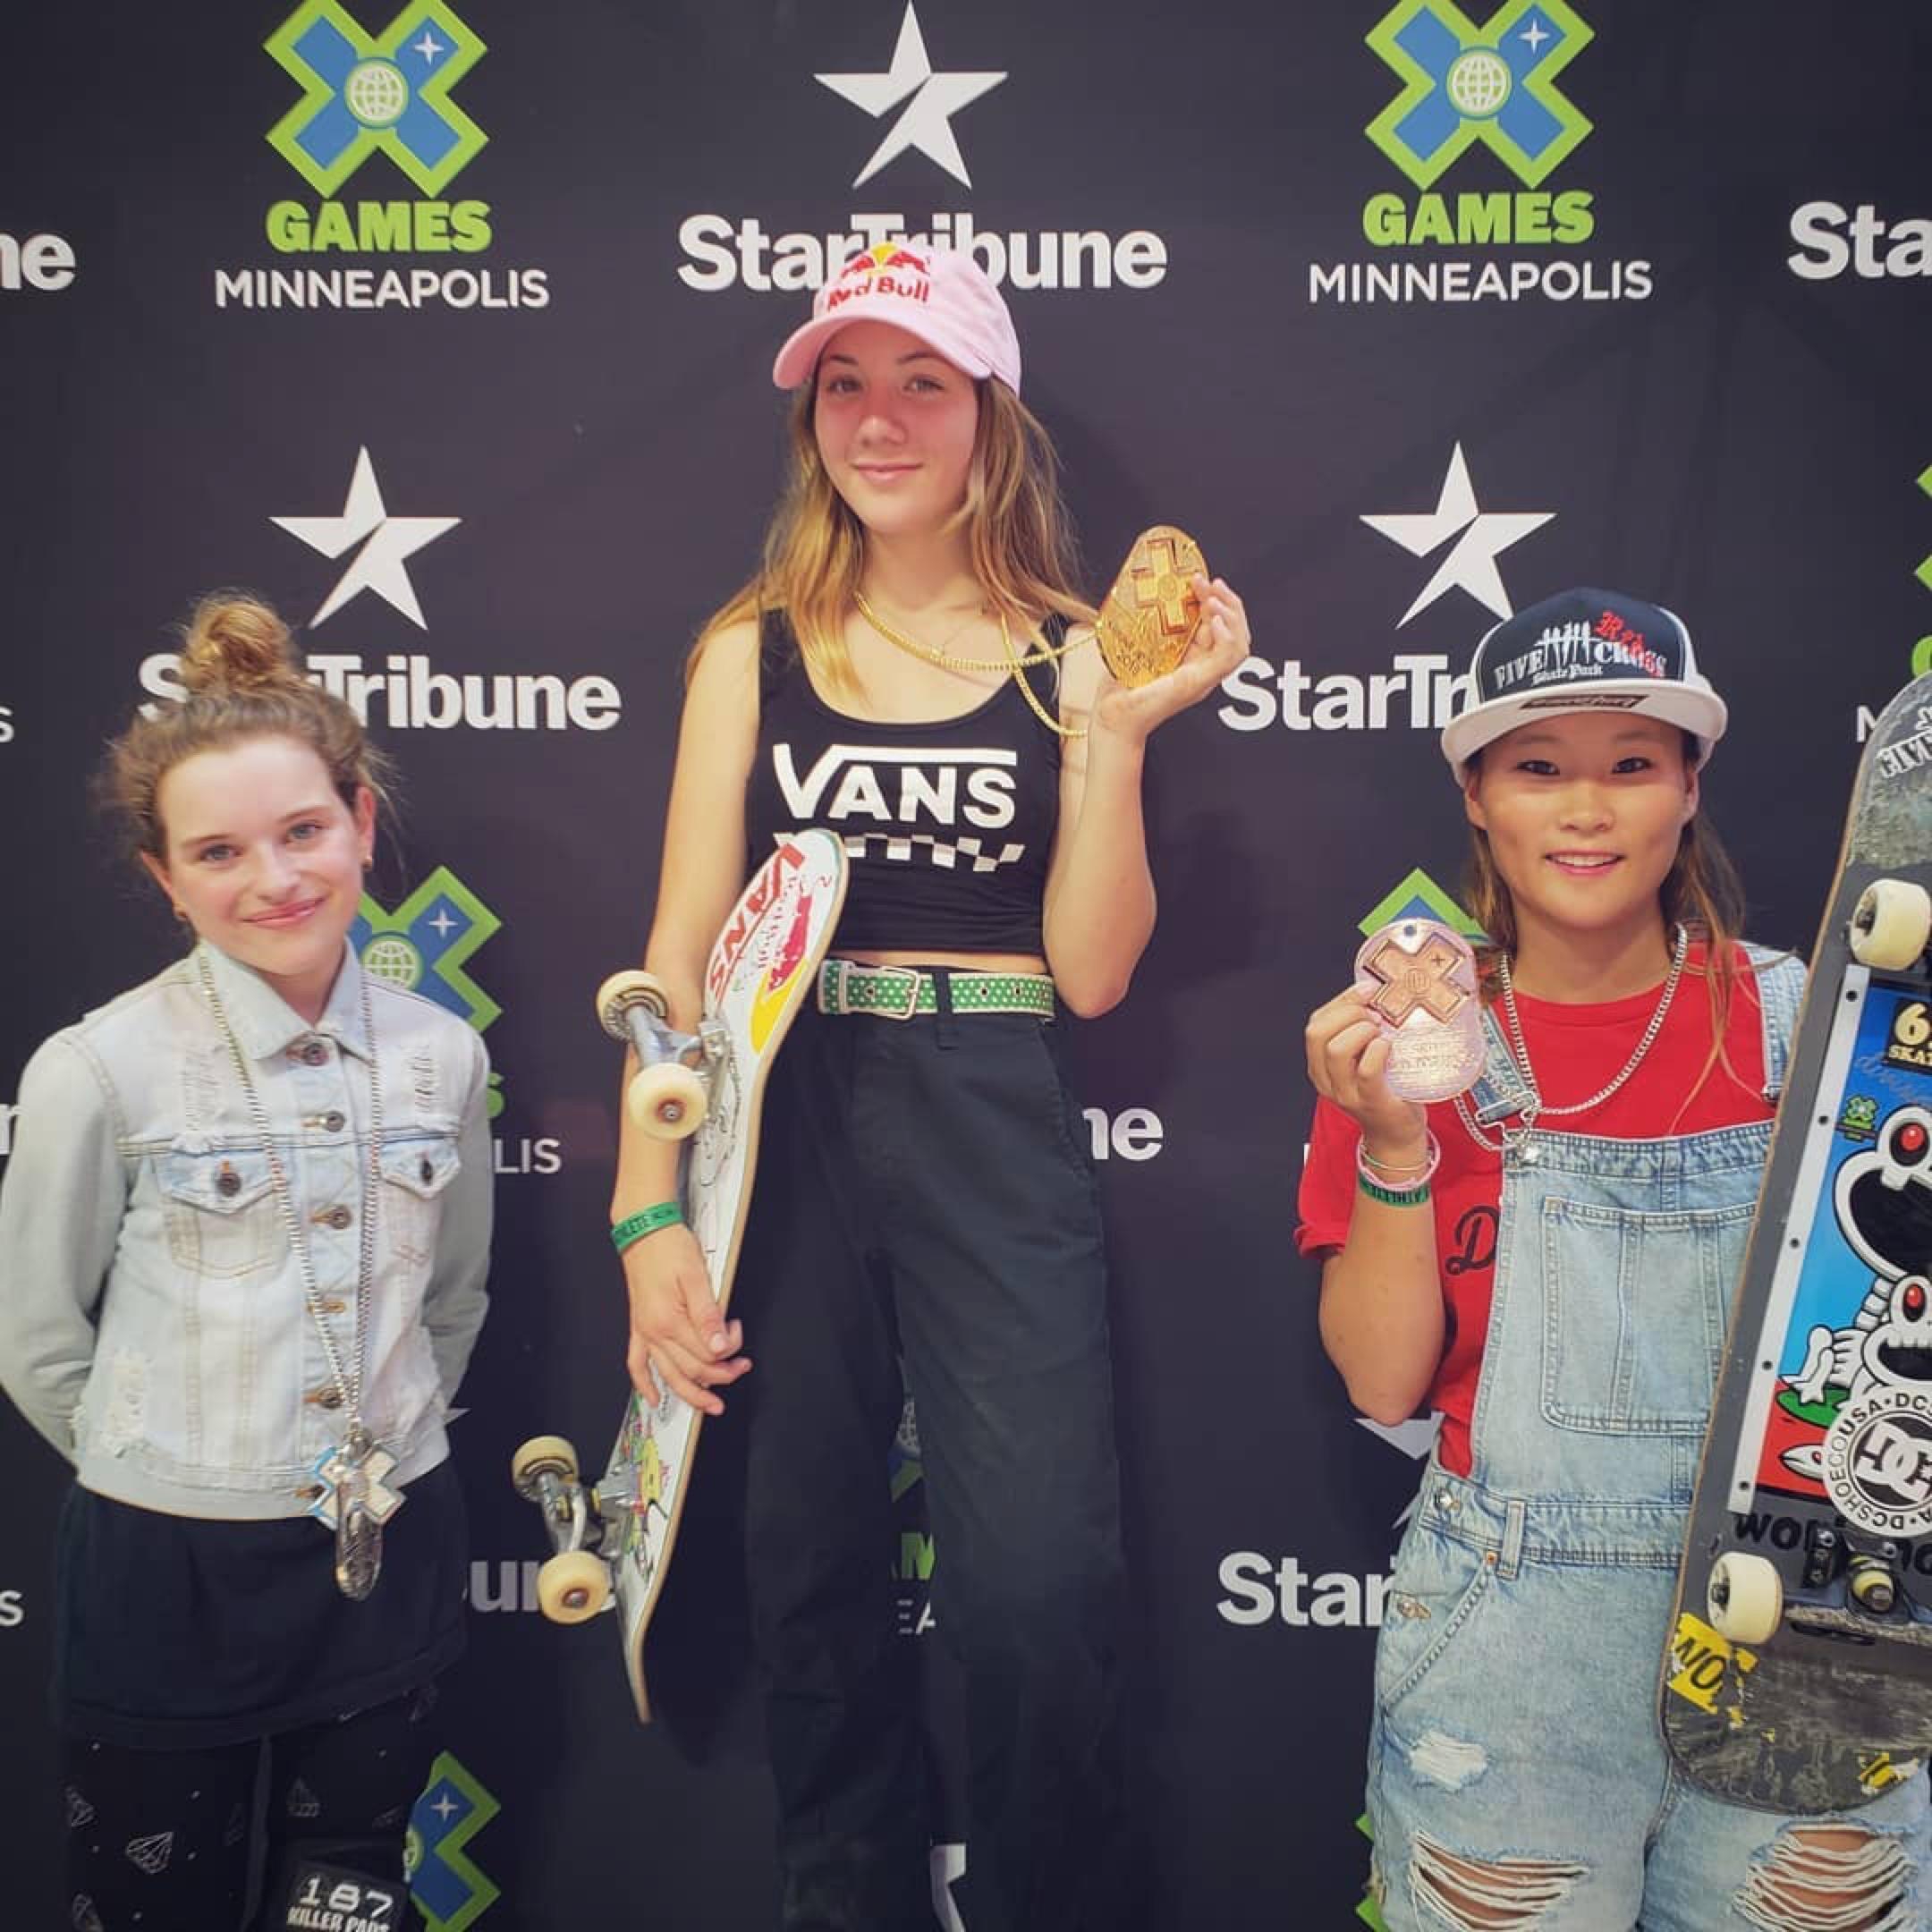 X Games Women's Park Podium 2018